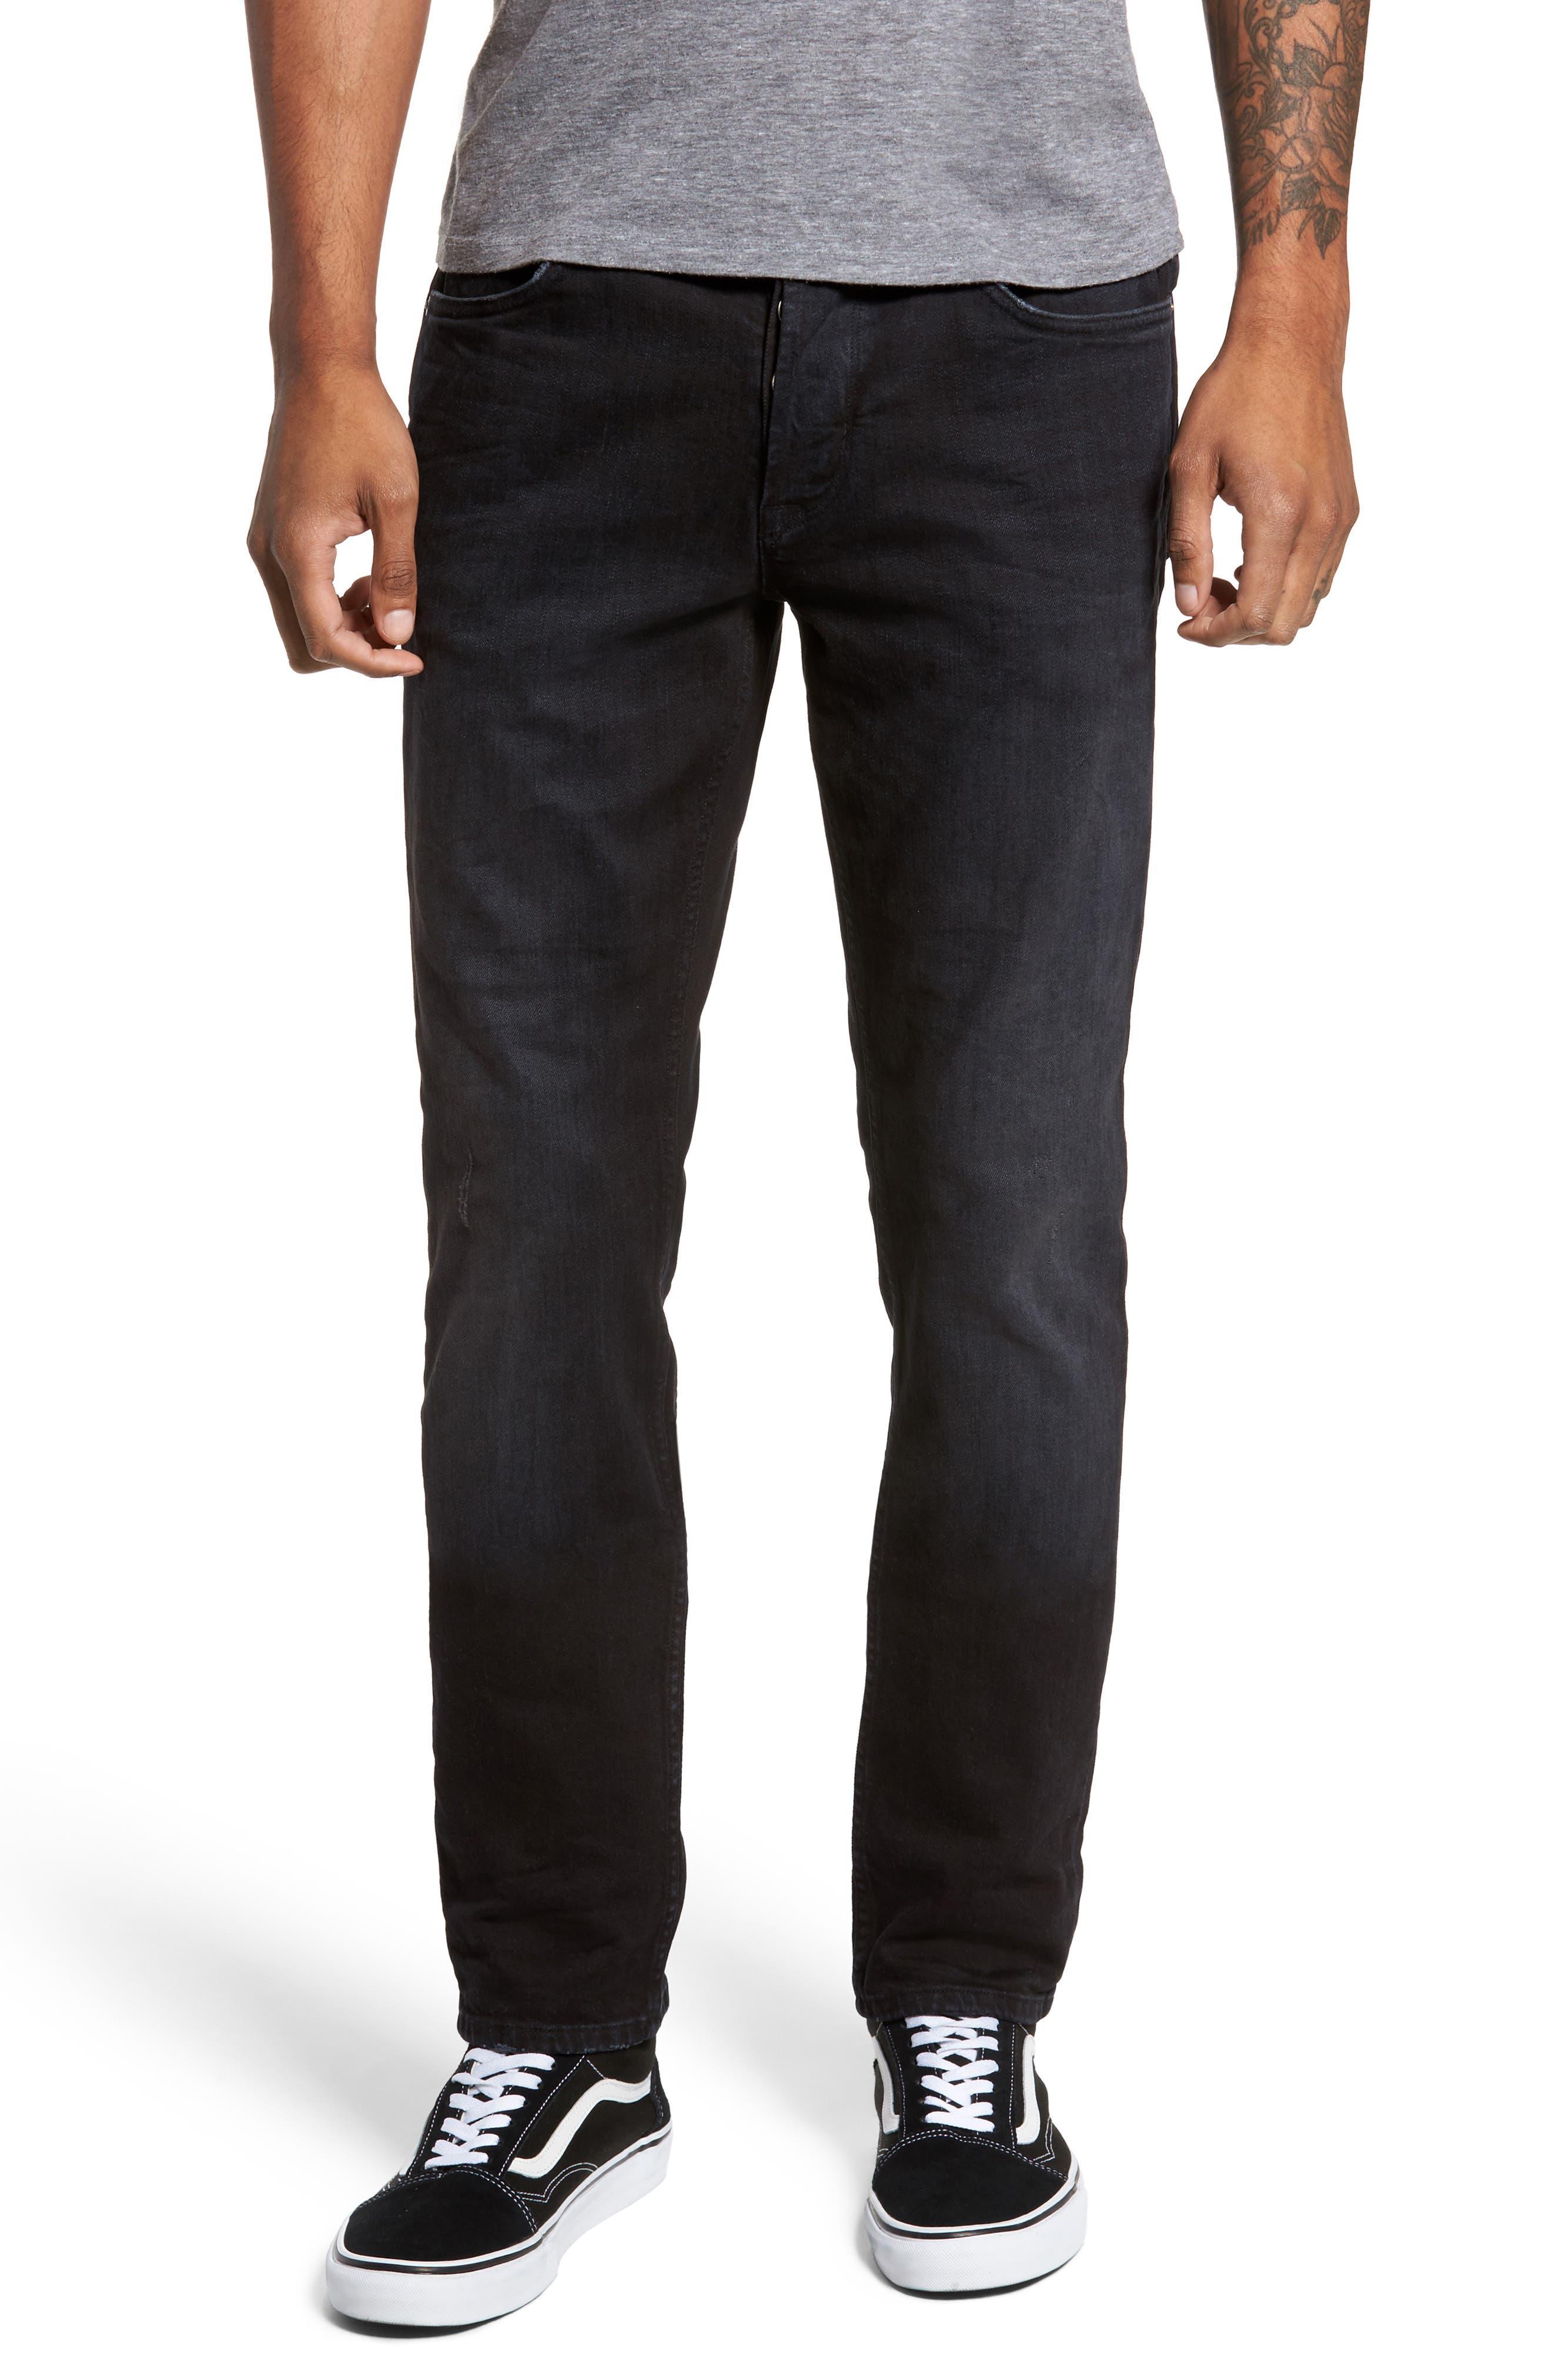 Sartor Skinny Fit Jeans,                         Main,                         color, Low Key